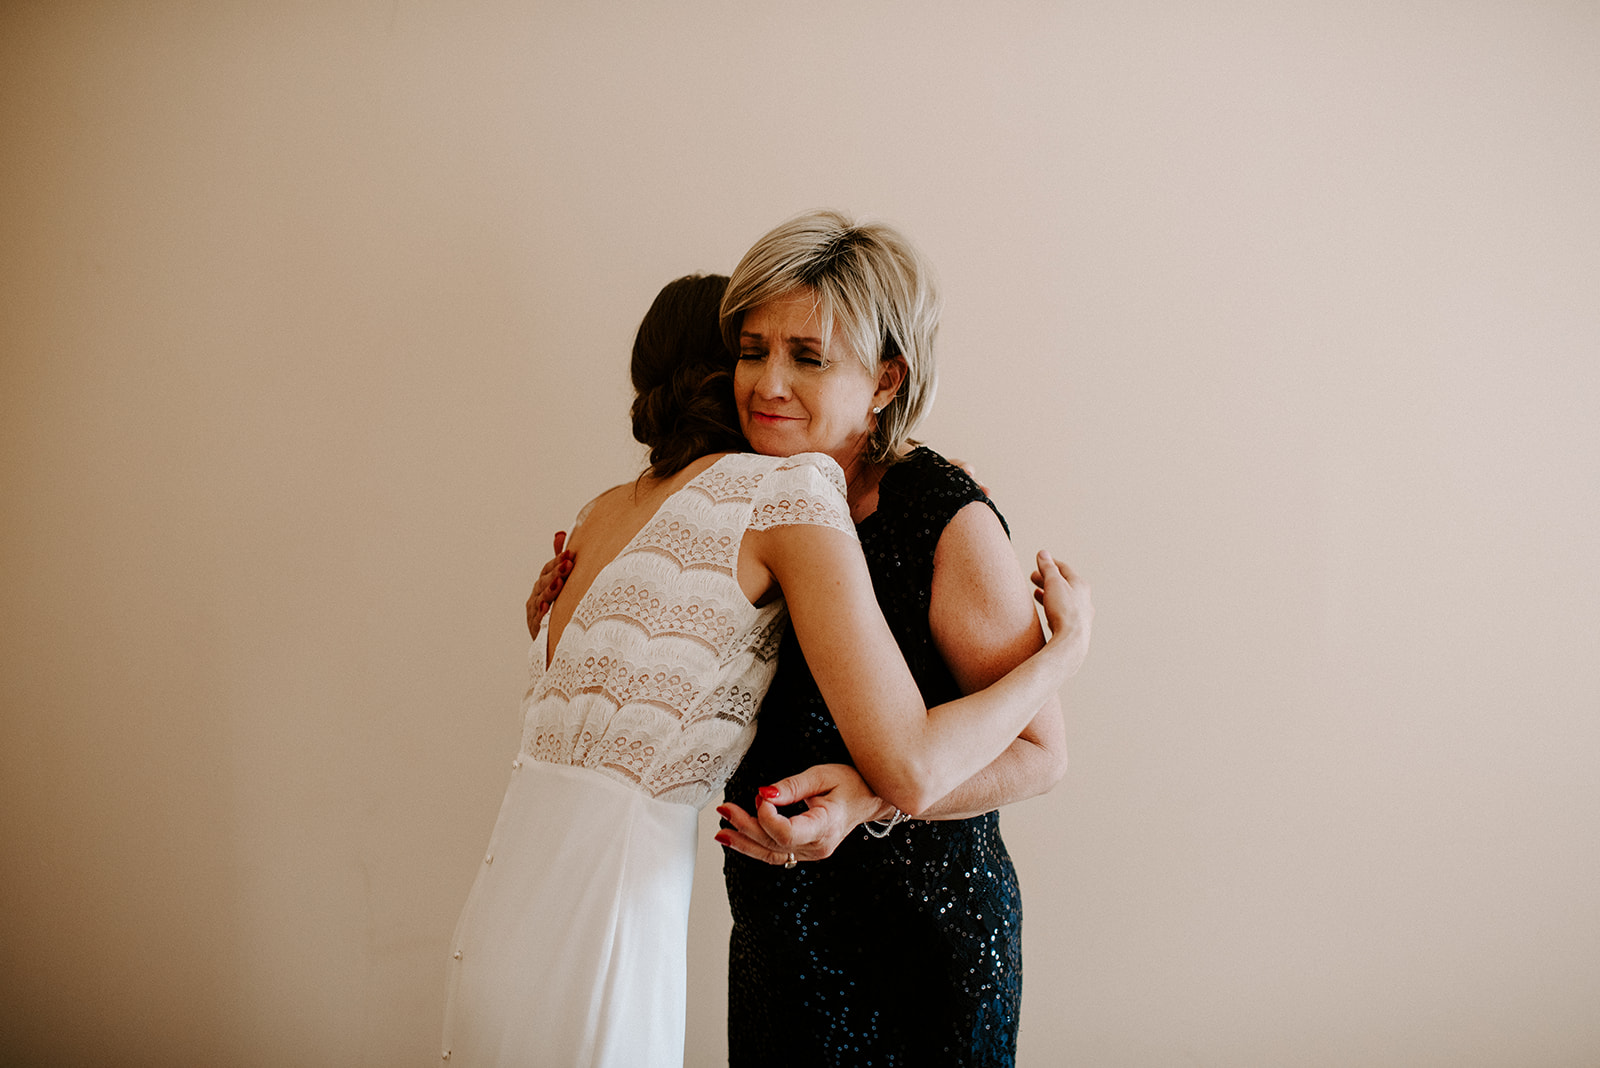 Cedarmont Farm Wedding featured on Nashville Bride Guide!